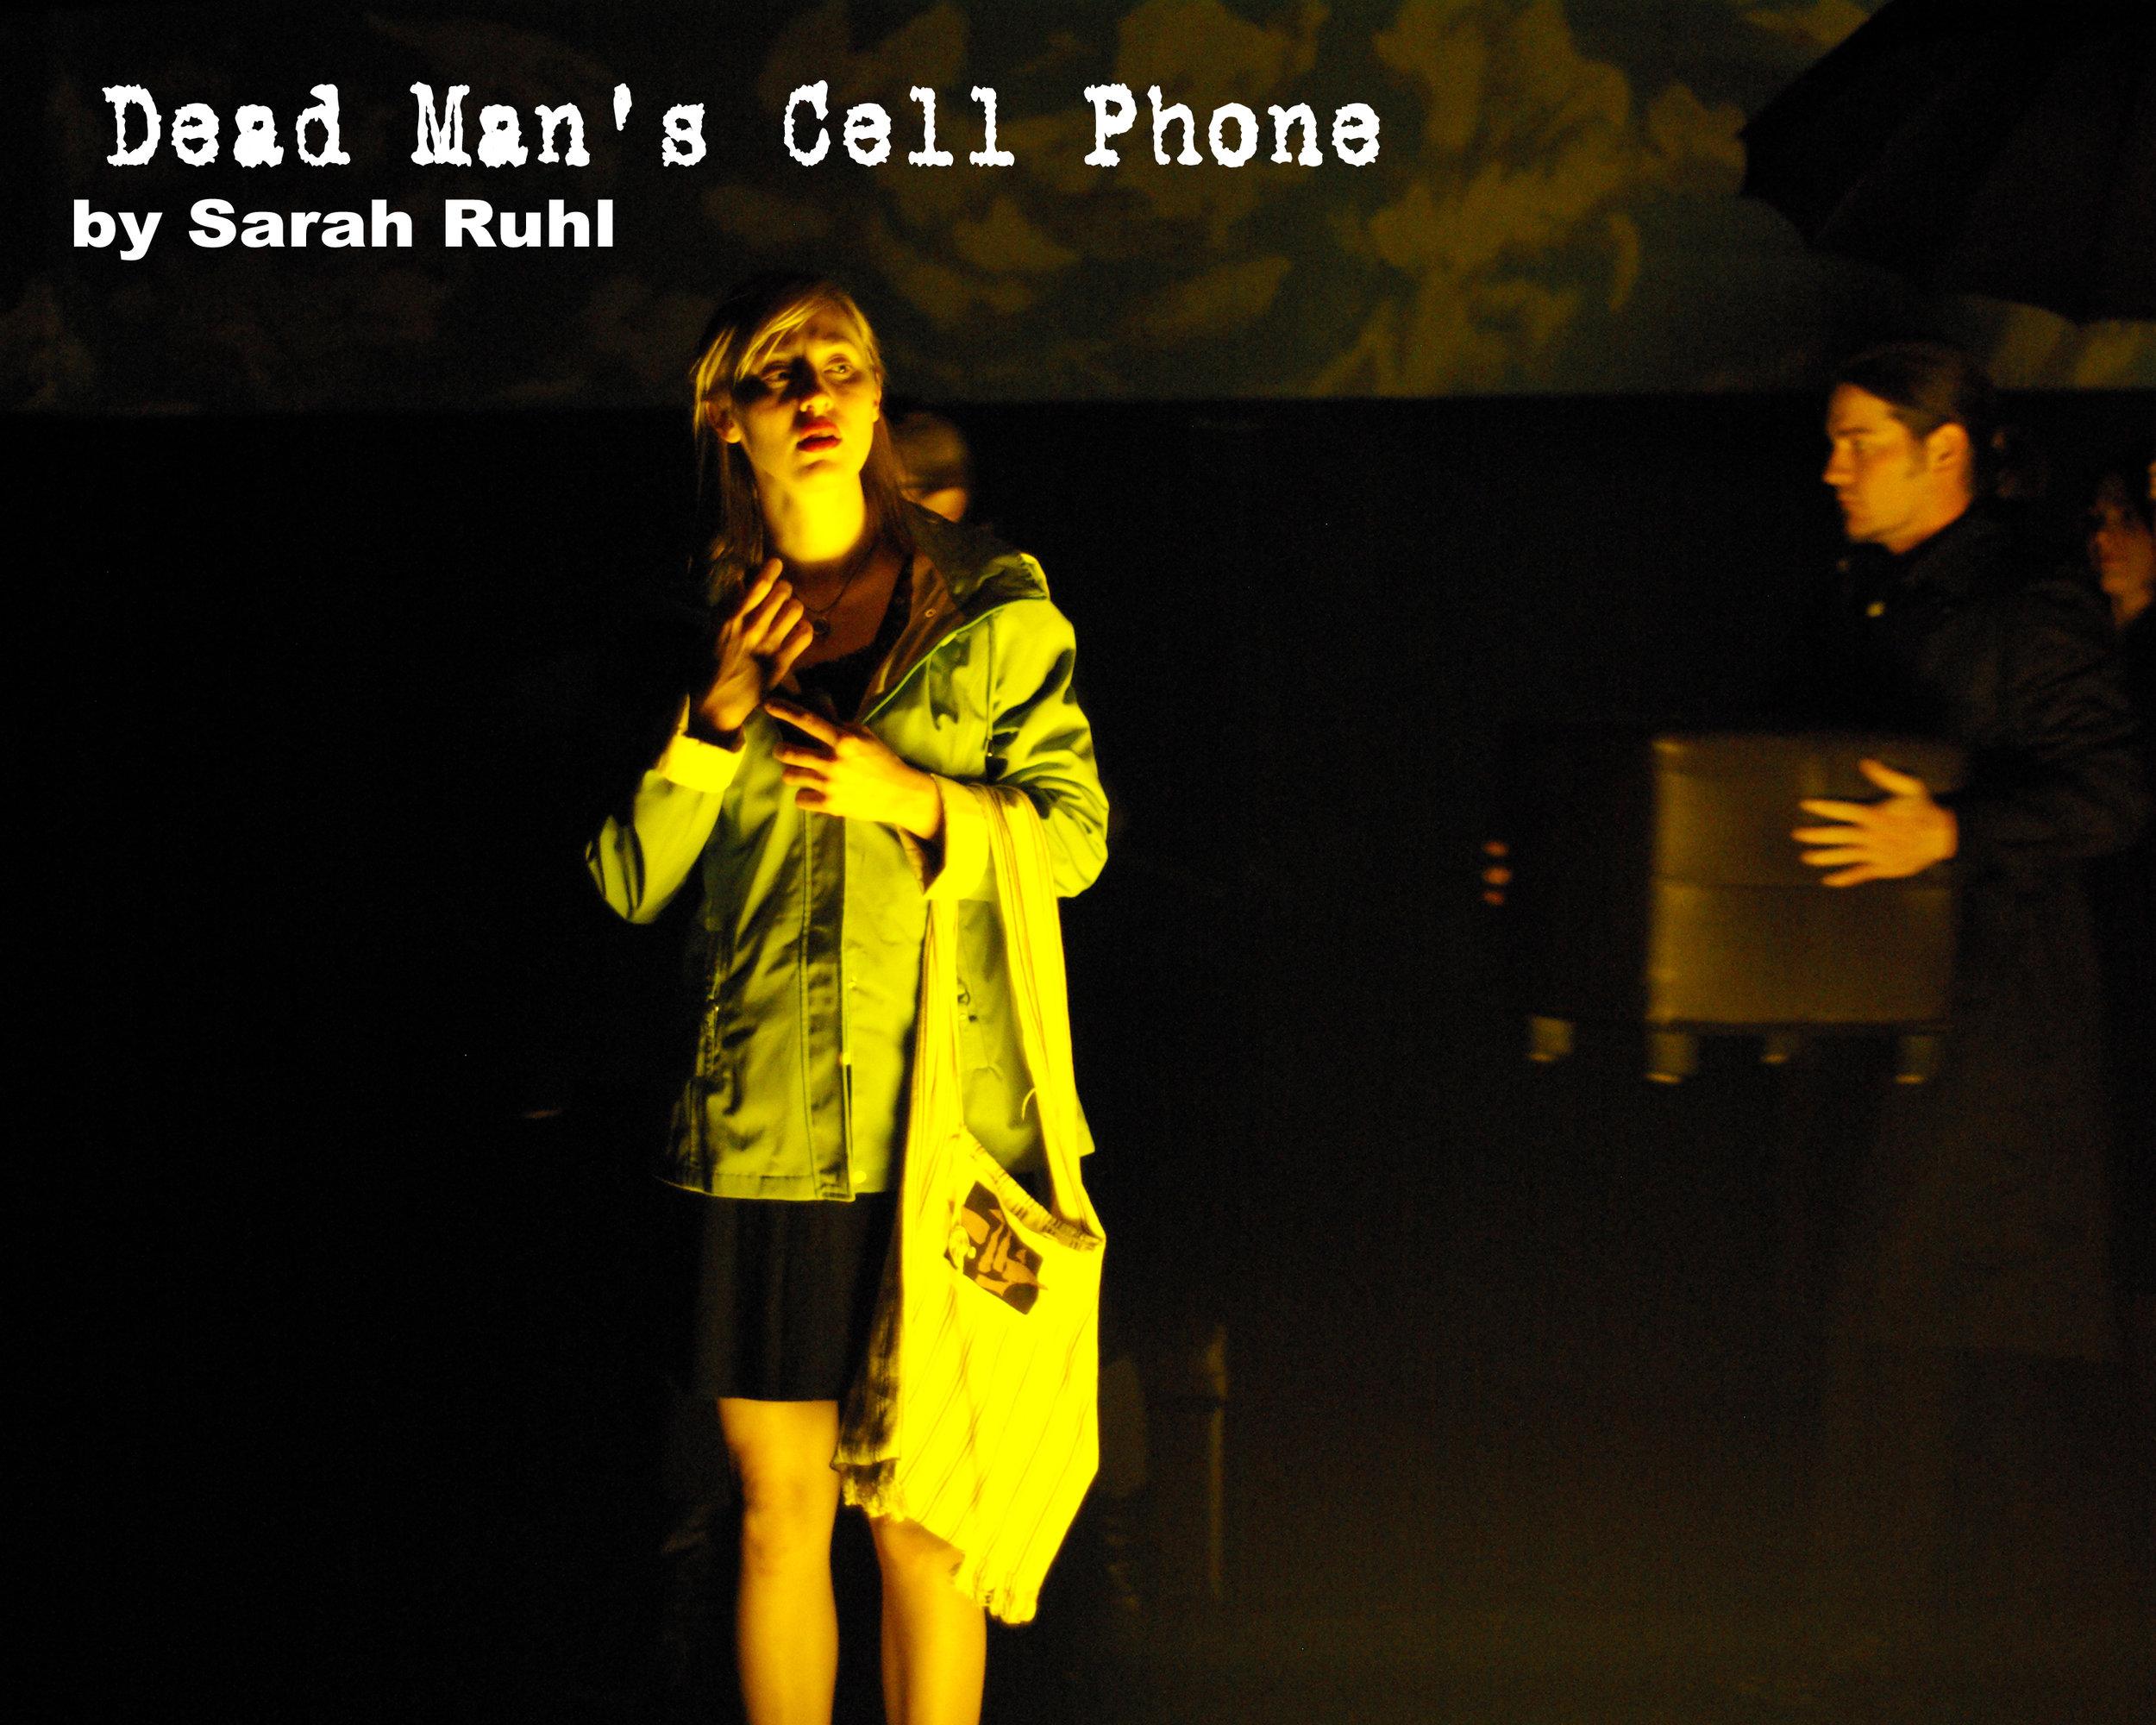 DeadMansCellPhone2.jpg